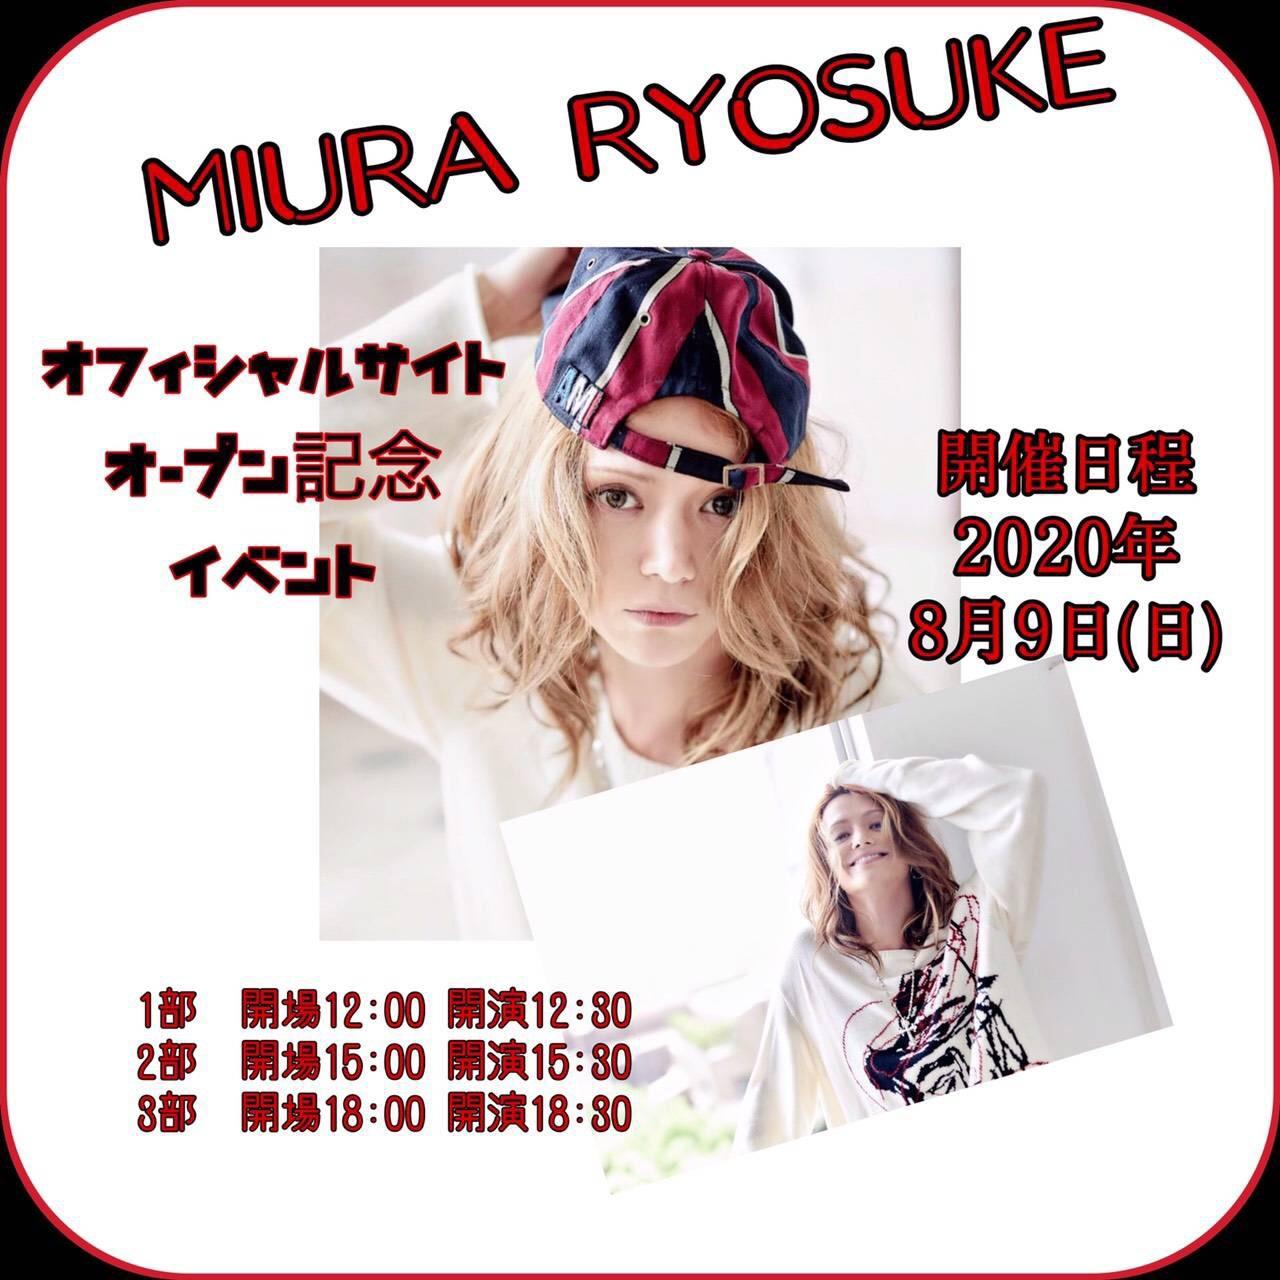 「MIURA RYOSUKE」オフィシャルサイトオープン記念イベント 2部